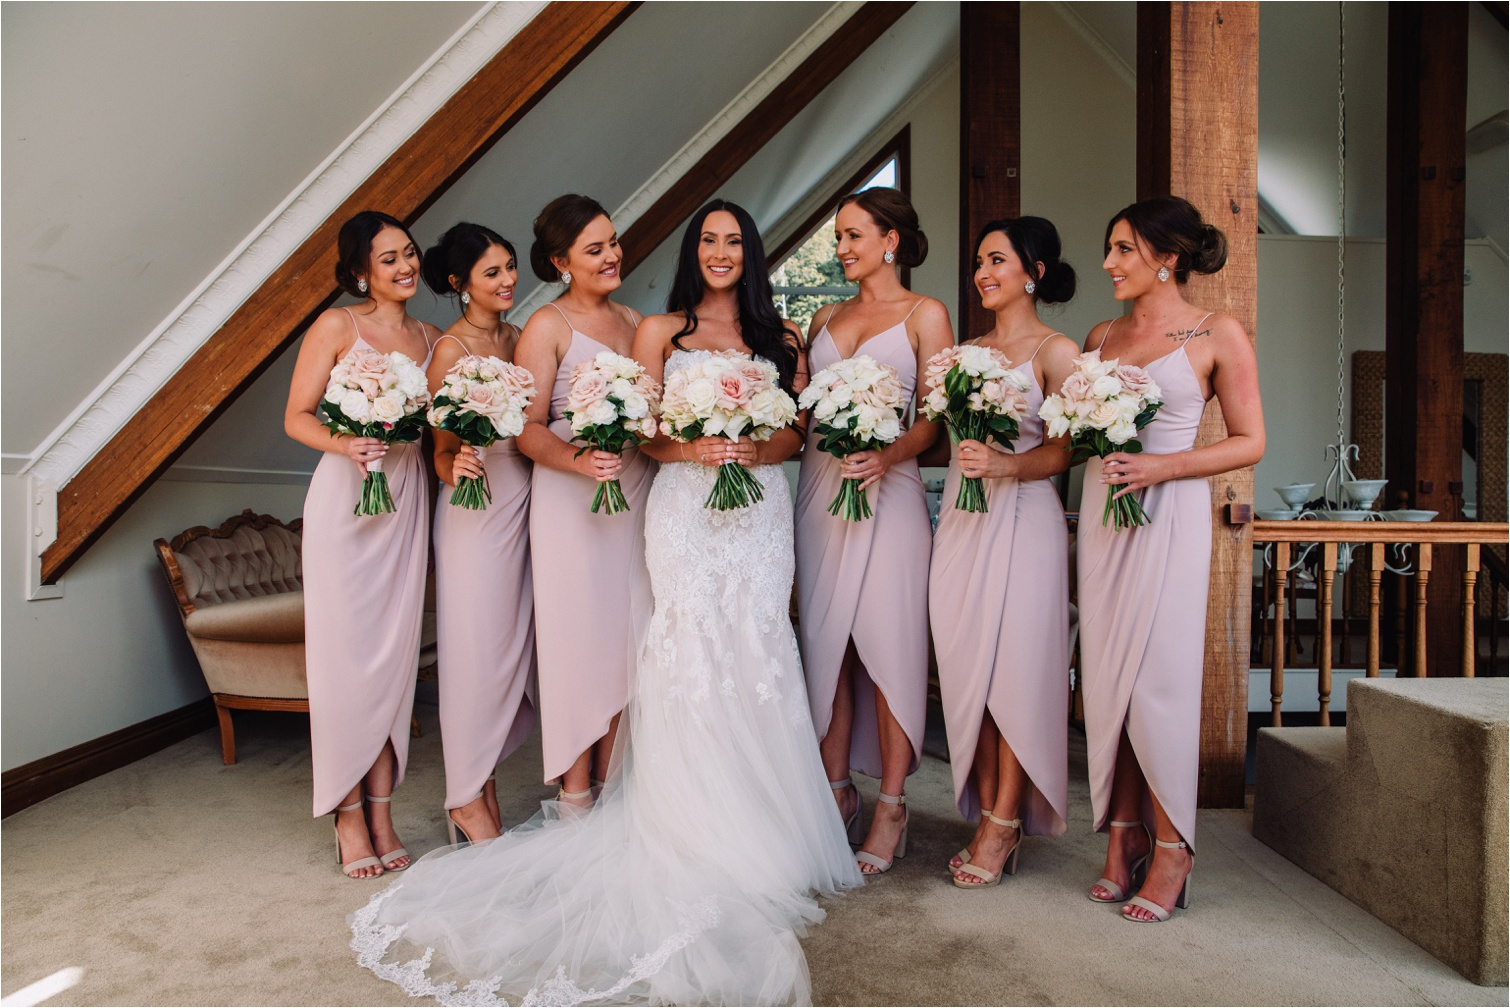 Maleny Manor Wedding Photography - Gold Coast Wedding Photographer_0019.jpg